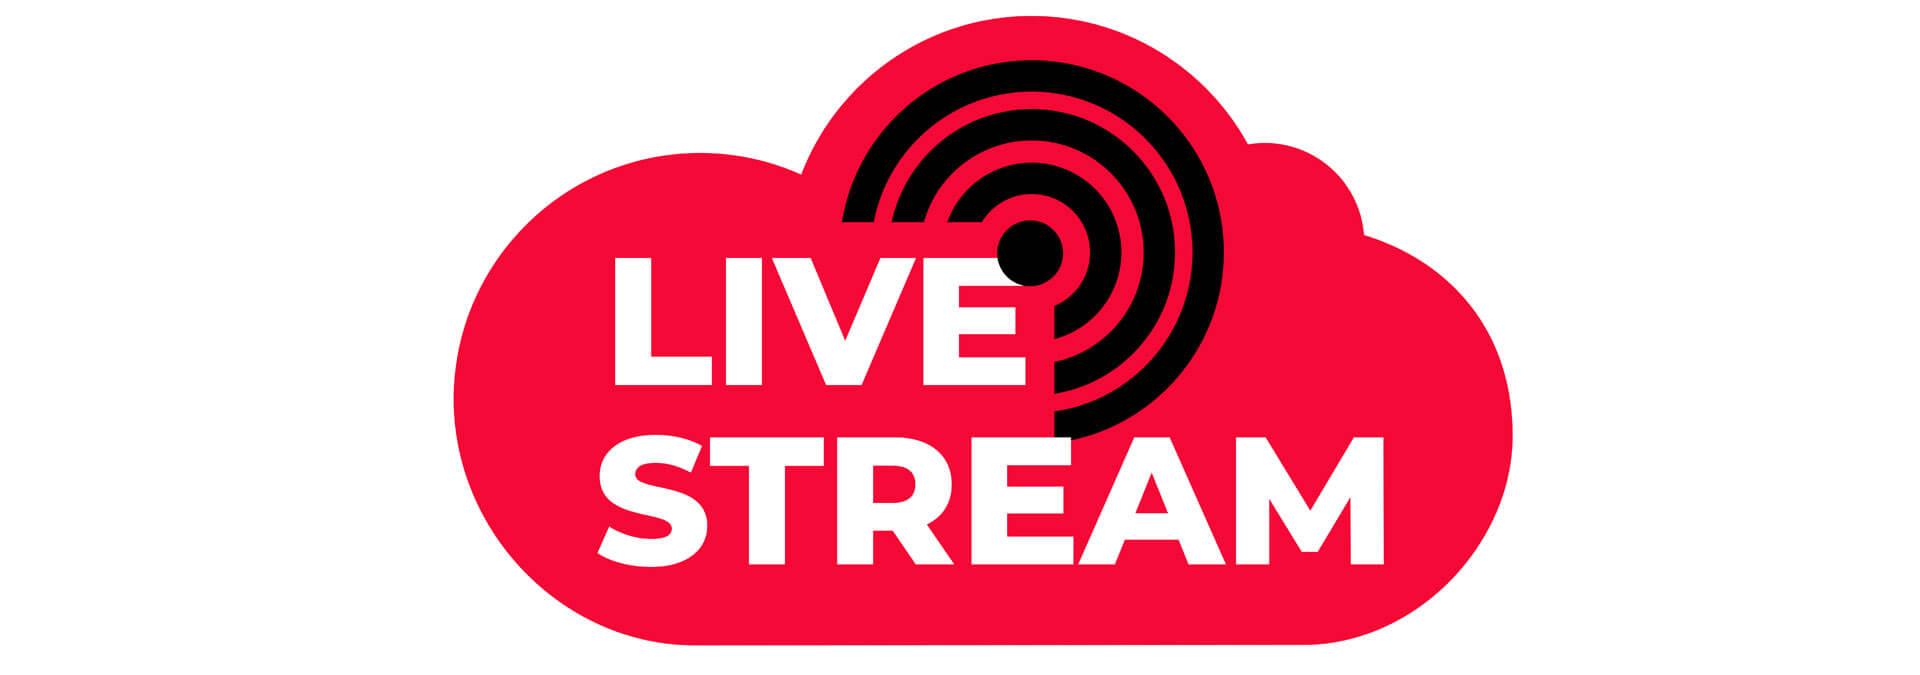 Live Streaming beim Medienbüro Müller-Bringmann